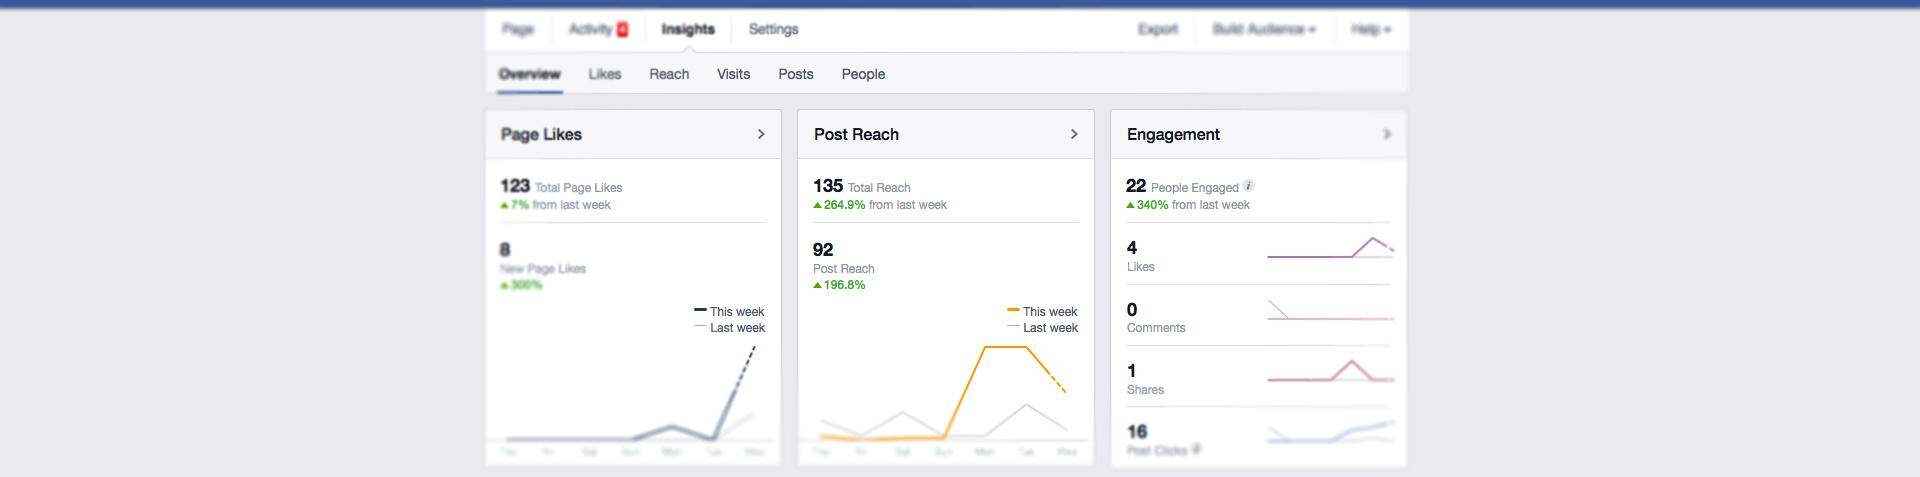 SocialMedia-Results-Facebook